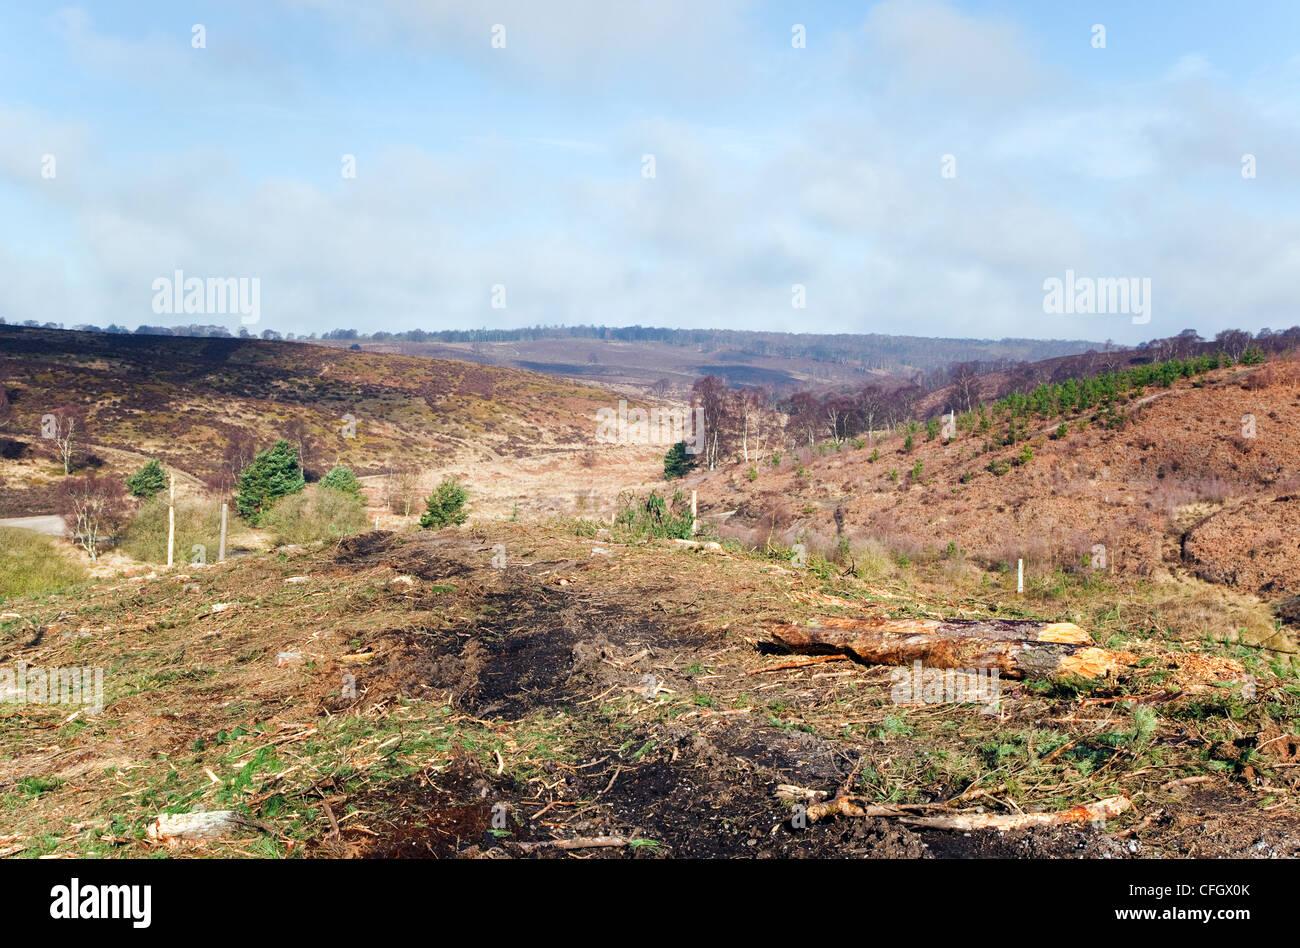 La deforestación Cannock Chase Country Park AONB (zona de excepcional belleza natural) en Staffordshire Inglaterra Imagen De Stock